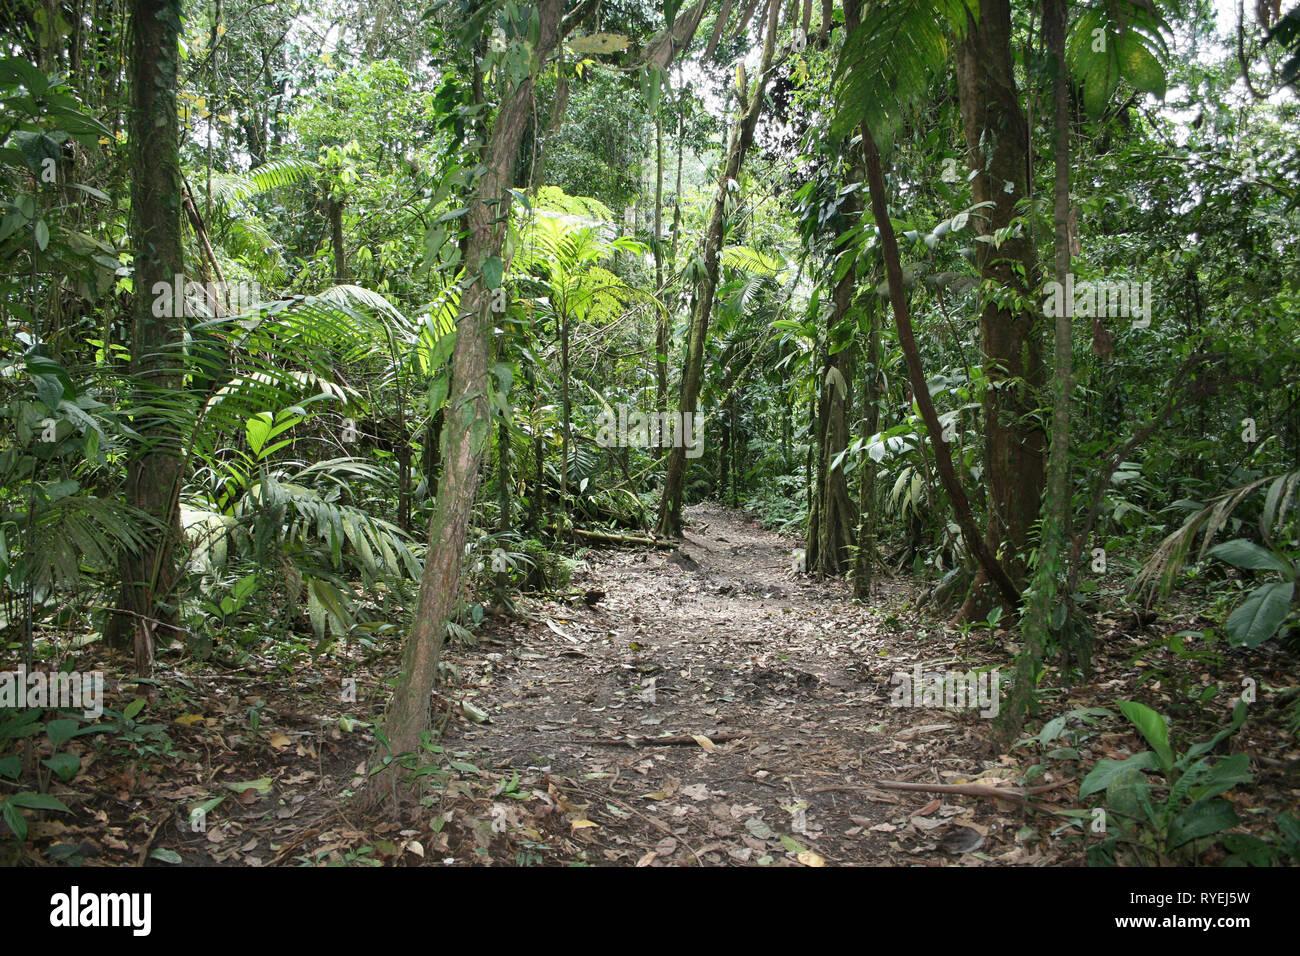 Costa Rica Rainforest in Arenal National Park, La Fortuna, Alajuela Province, Costa Rica - Stock Image